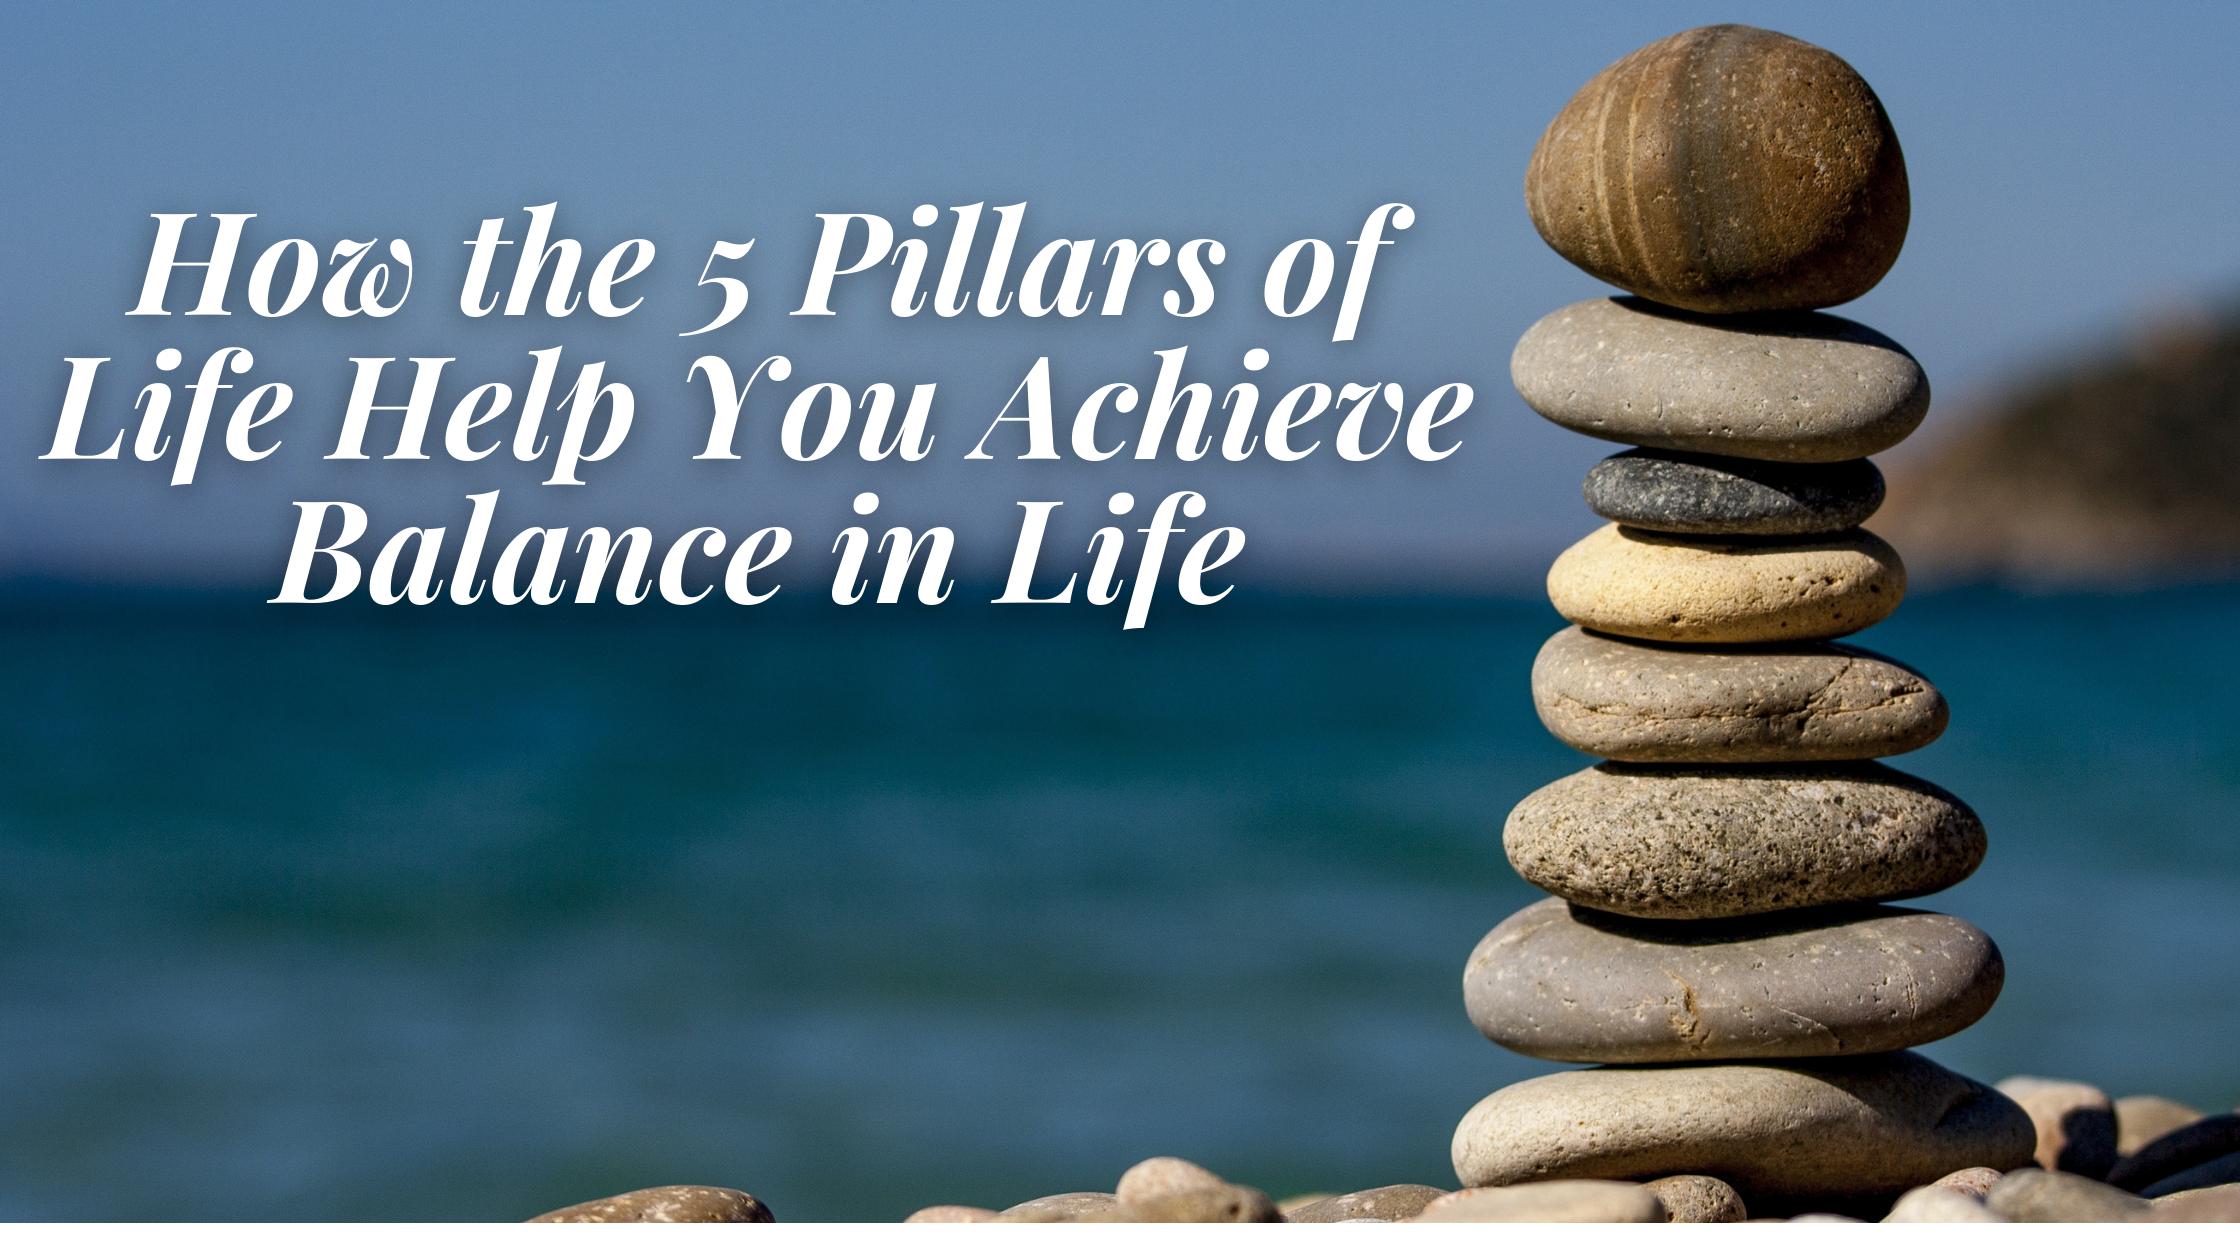 5 Pillars to Achieving Life Balance